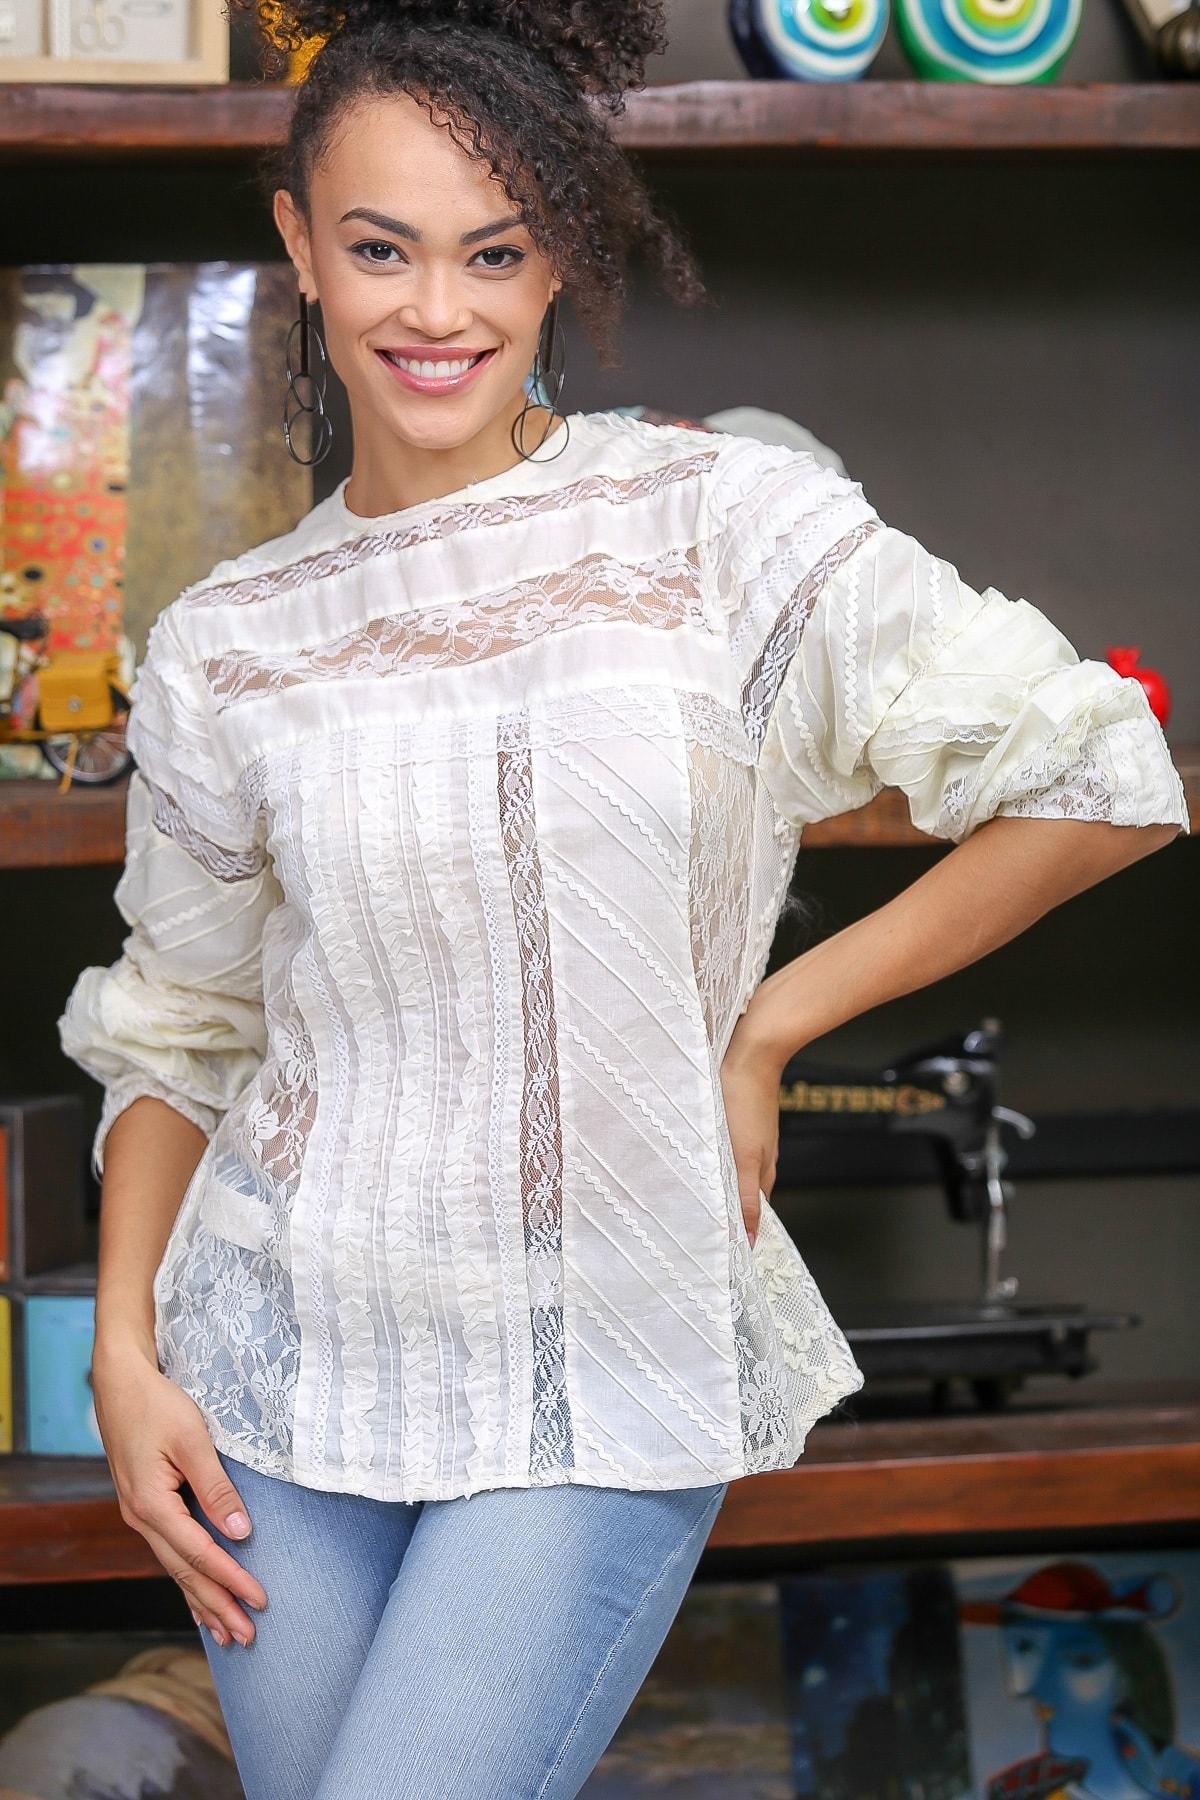 Chiccy Kadın Ekru Vintage Patchwork Dantel Detaylı Bluz M10010200BL96379